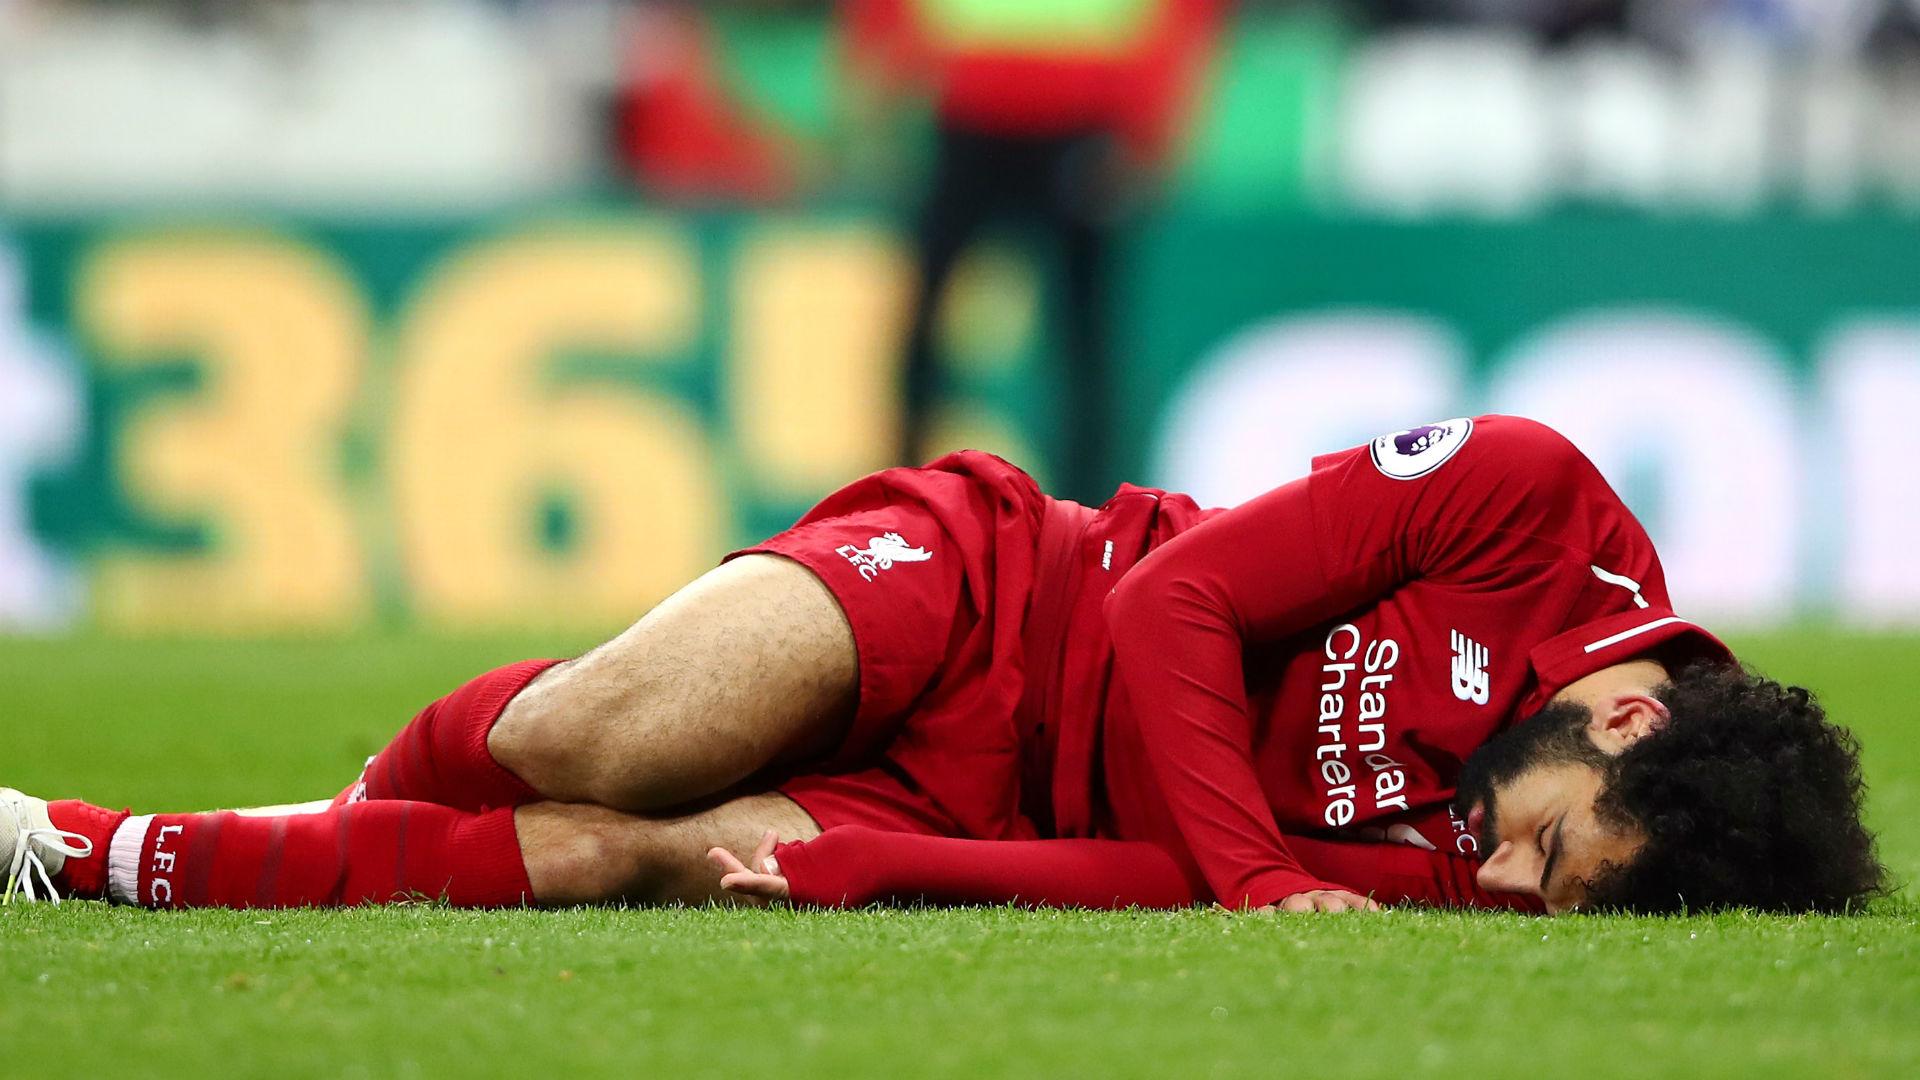 Newcastle goalkeeper Martin Dubravka: We were scared with Mohamed Salah head injury